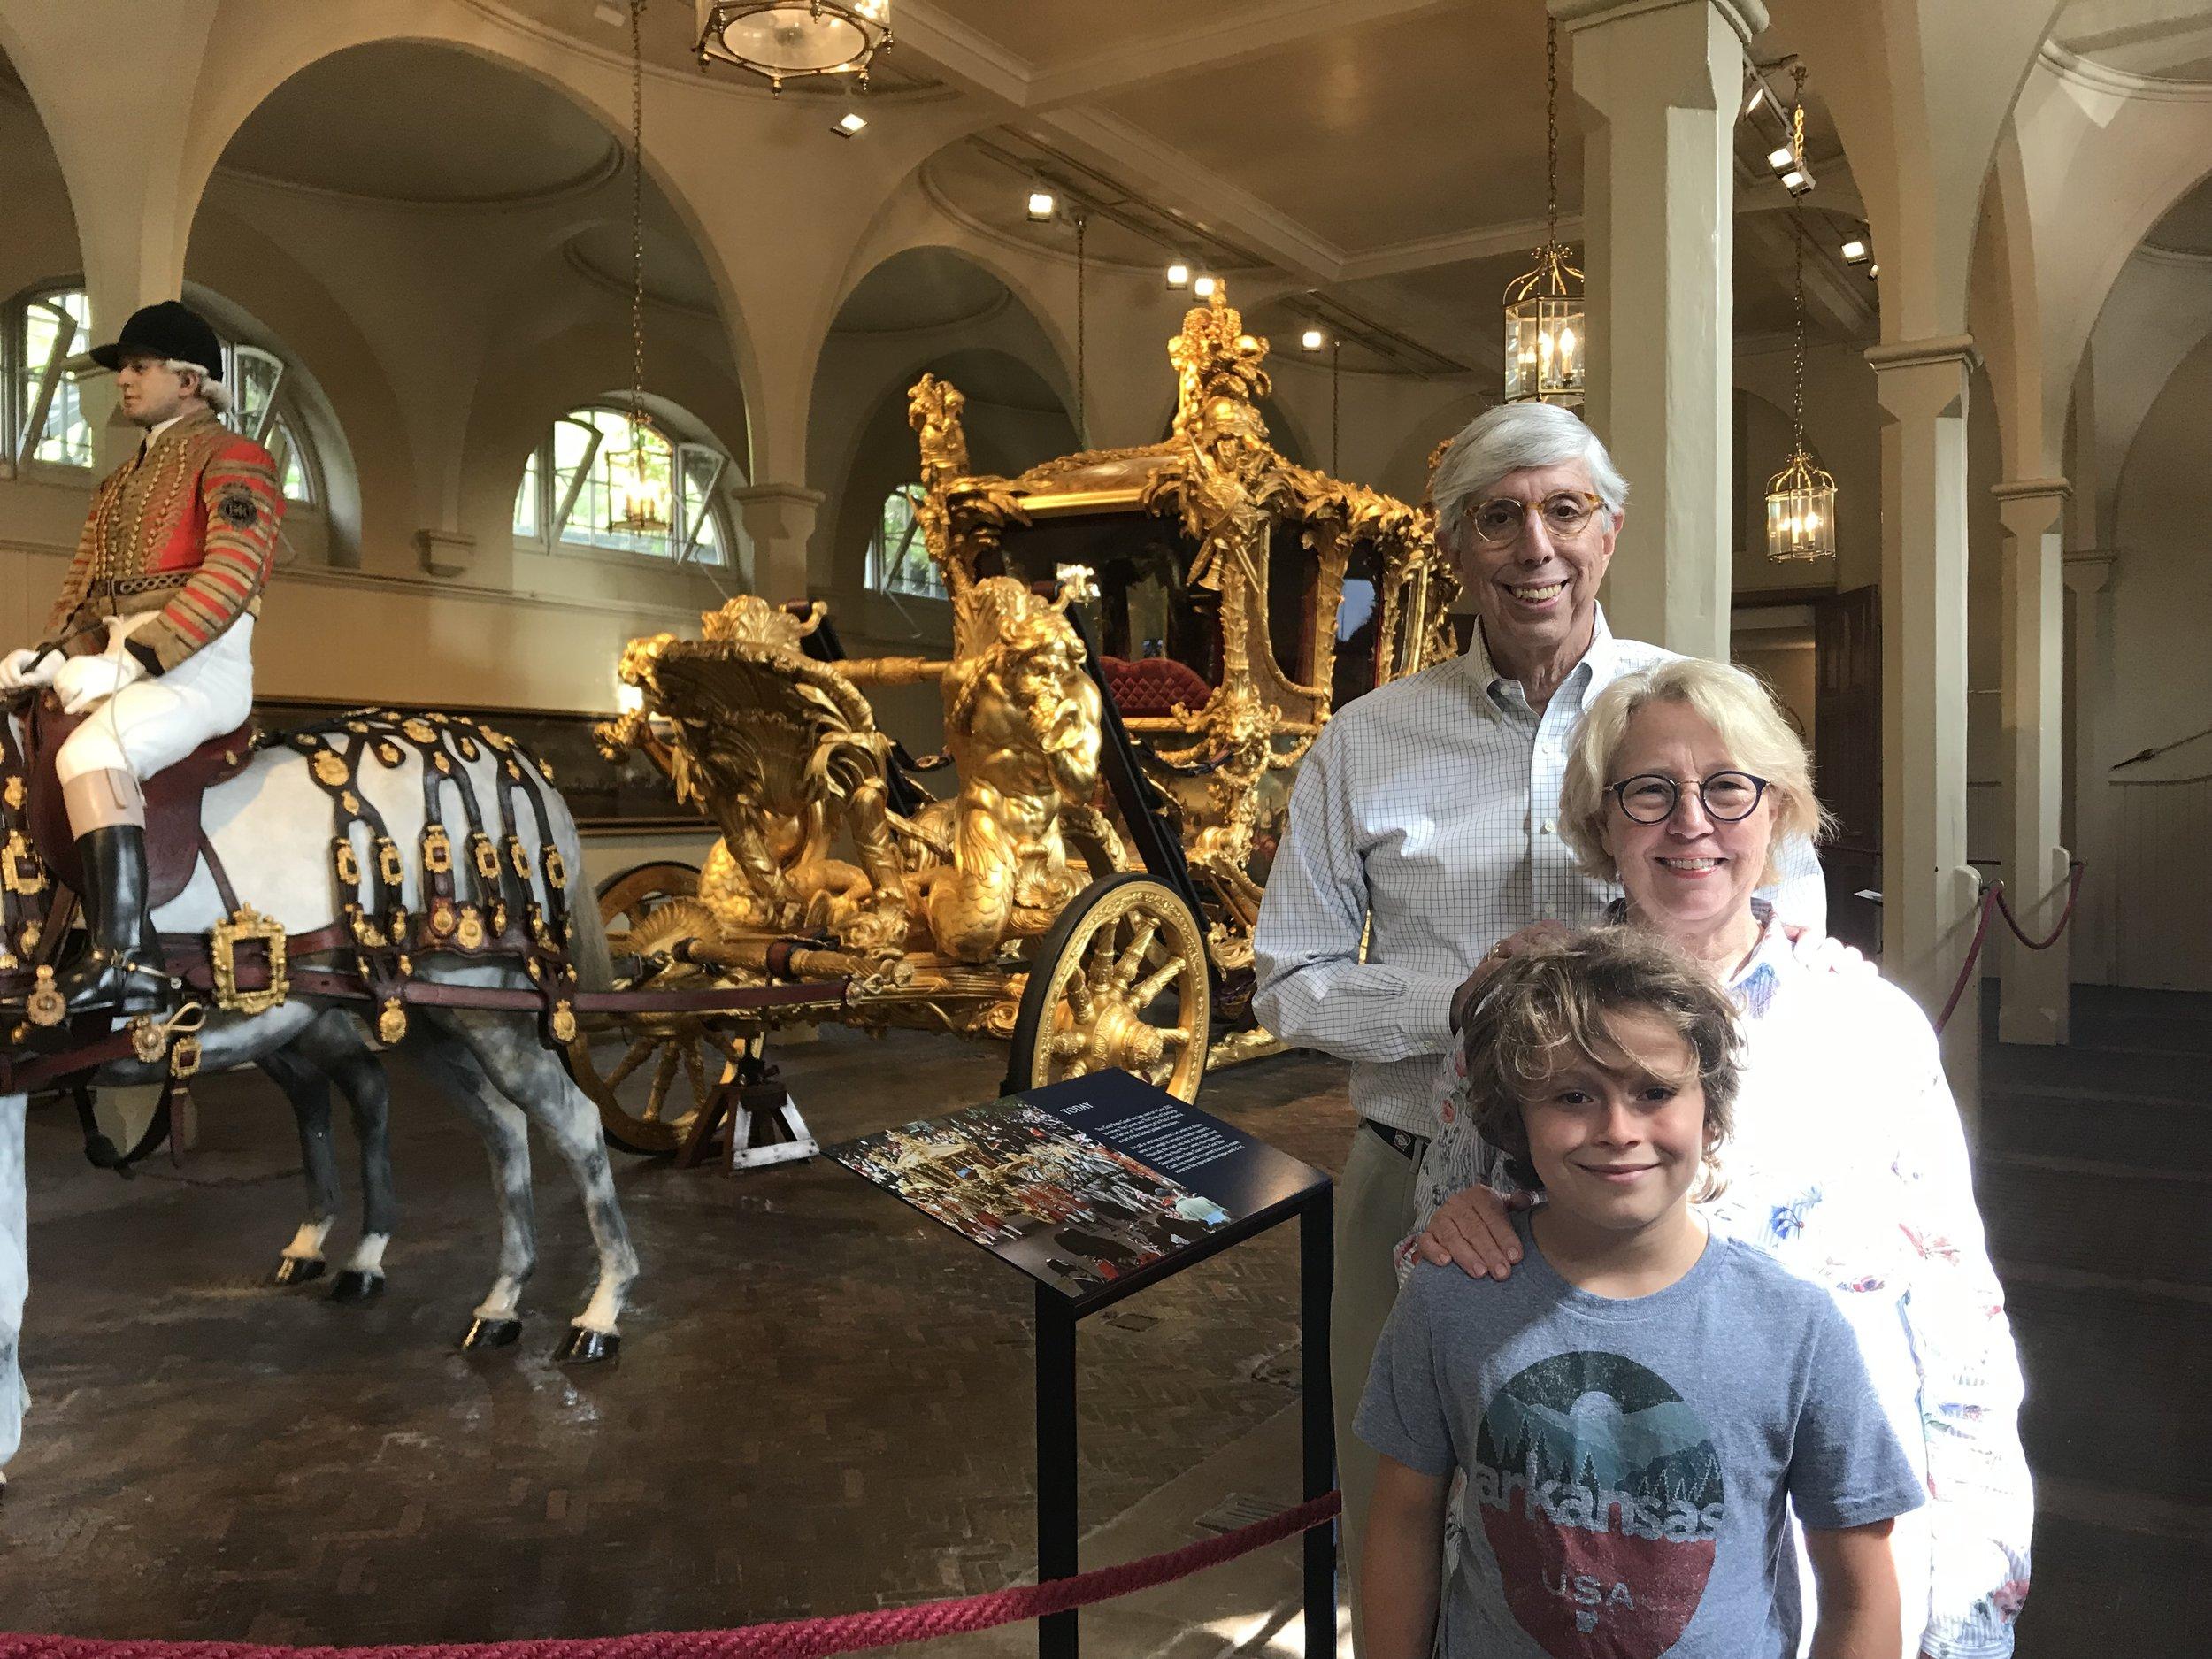 Rett & Becky Tucker with their grandson, Ellis, at Buckingham Palace.